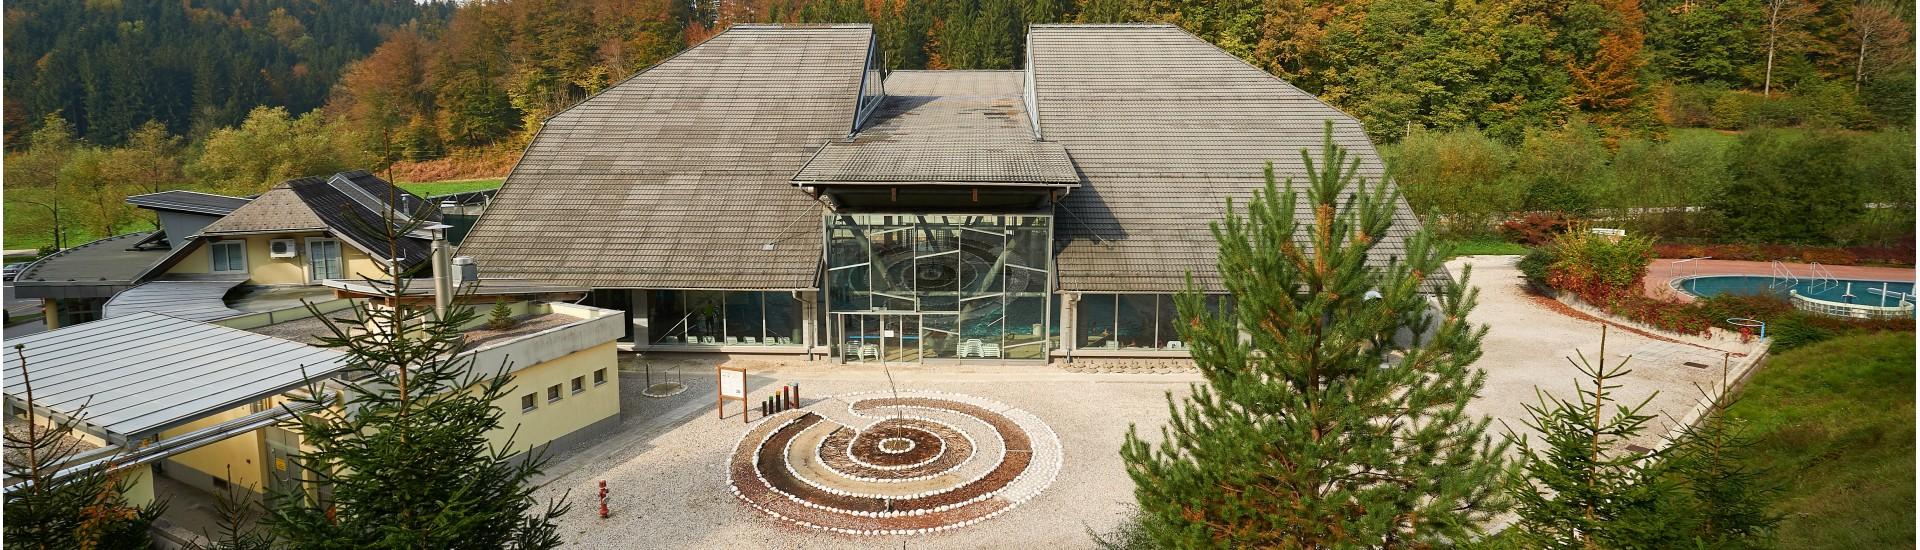 Supertrips - Vakantiepark Terme Snovik